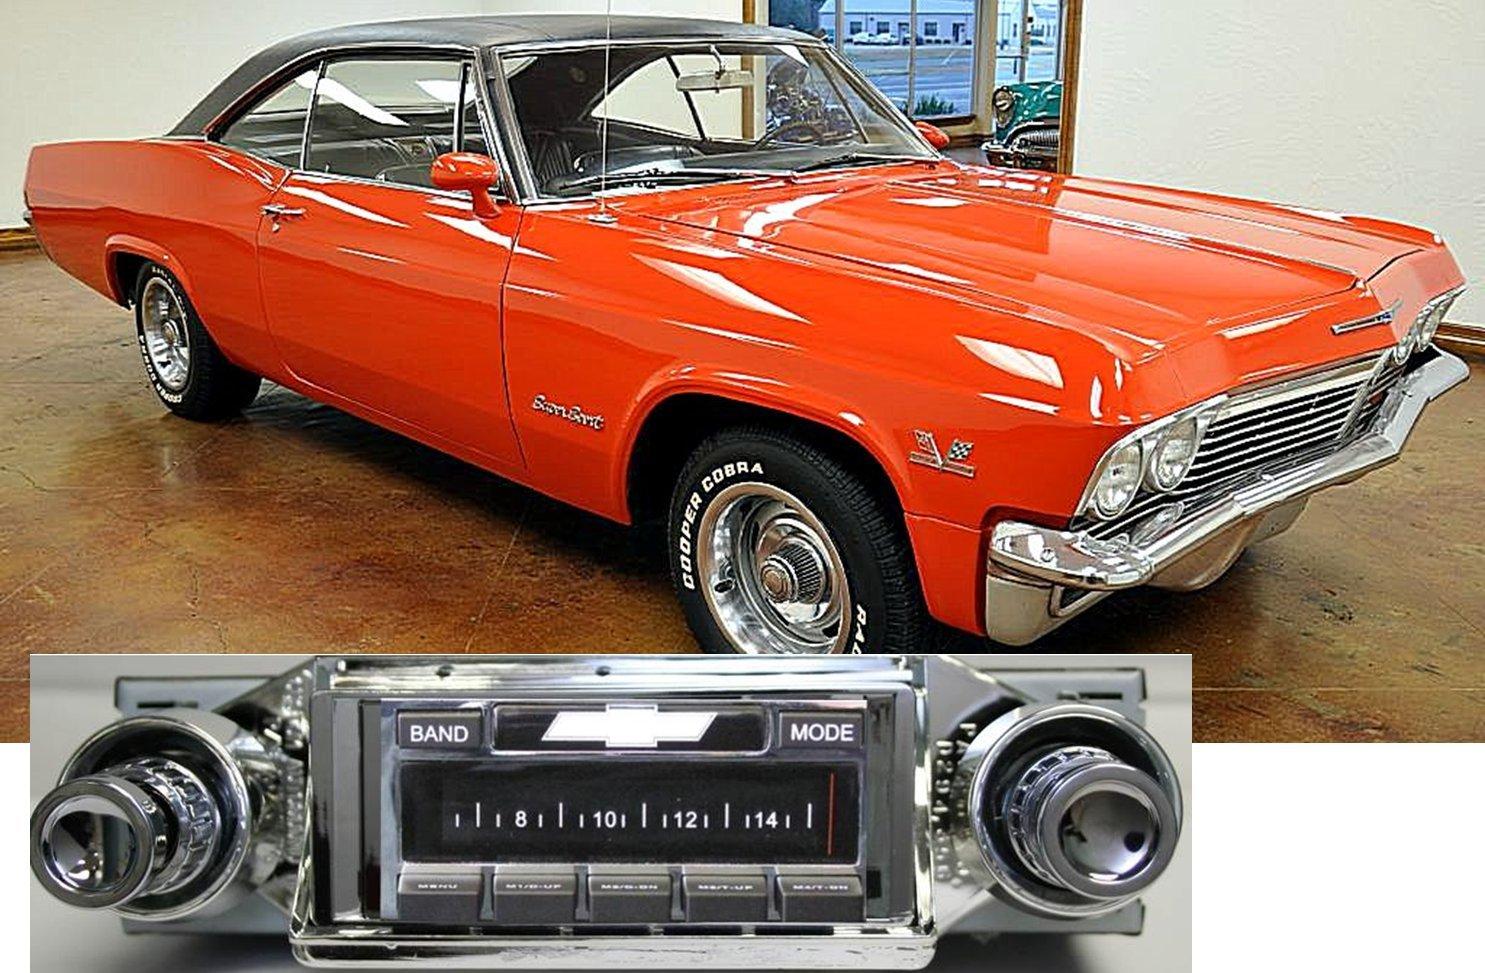 Amazon.com: 1965 Chevy Impala USA-630 II High Power 300 watt AM FM ...